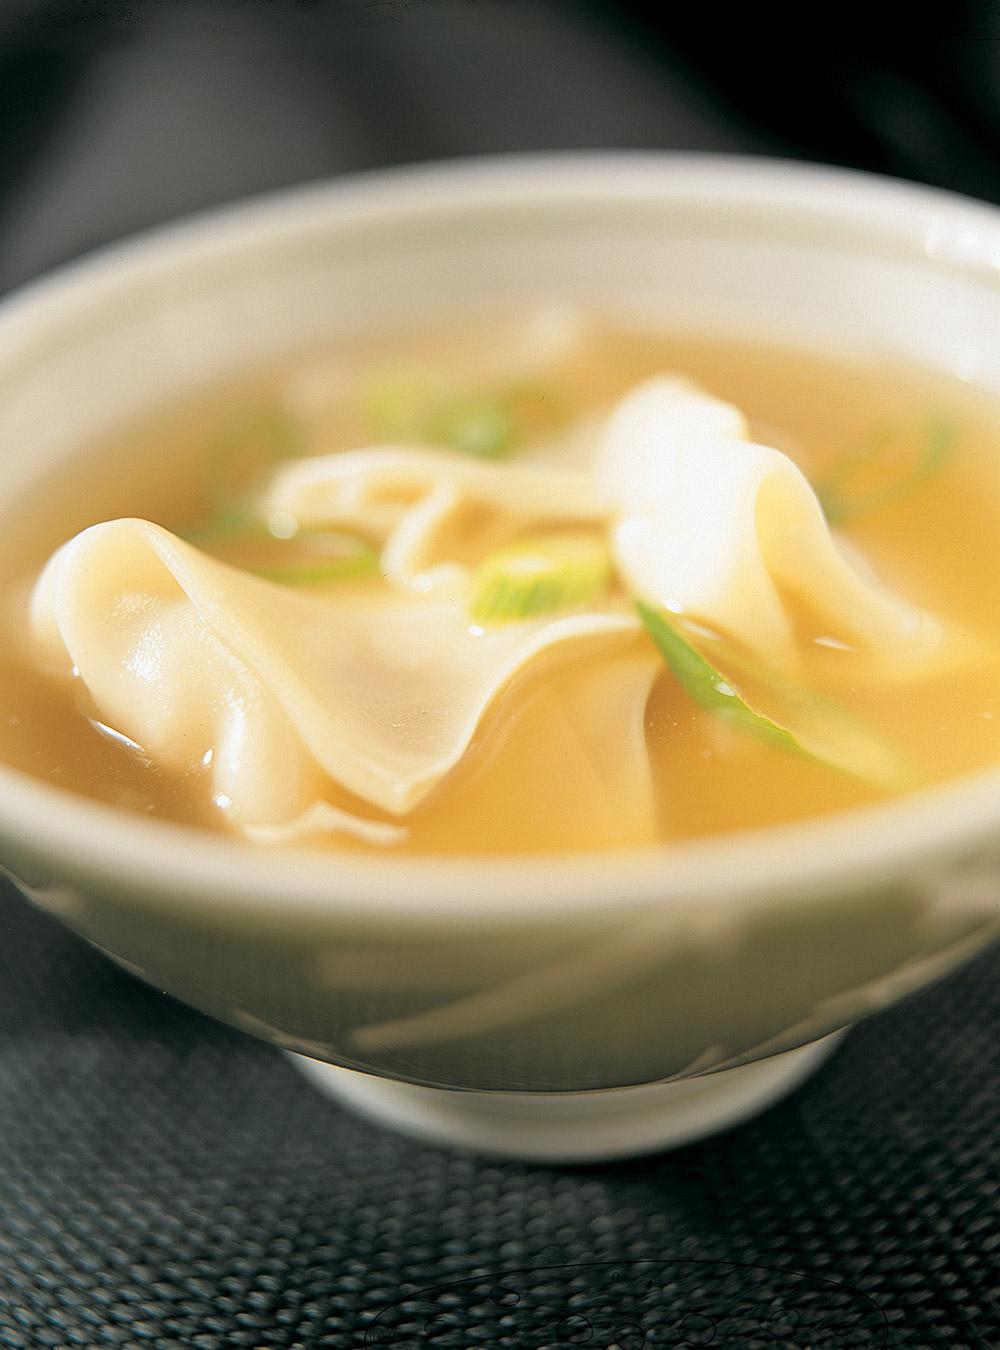 soupe won ton potage aux raviolis chinois ricardo. Black Bedroom Furniture Sets. Home Design Ideas